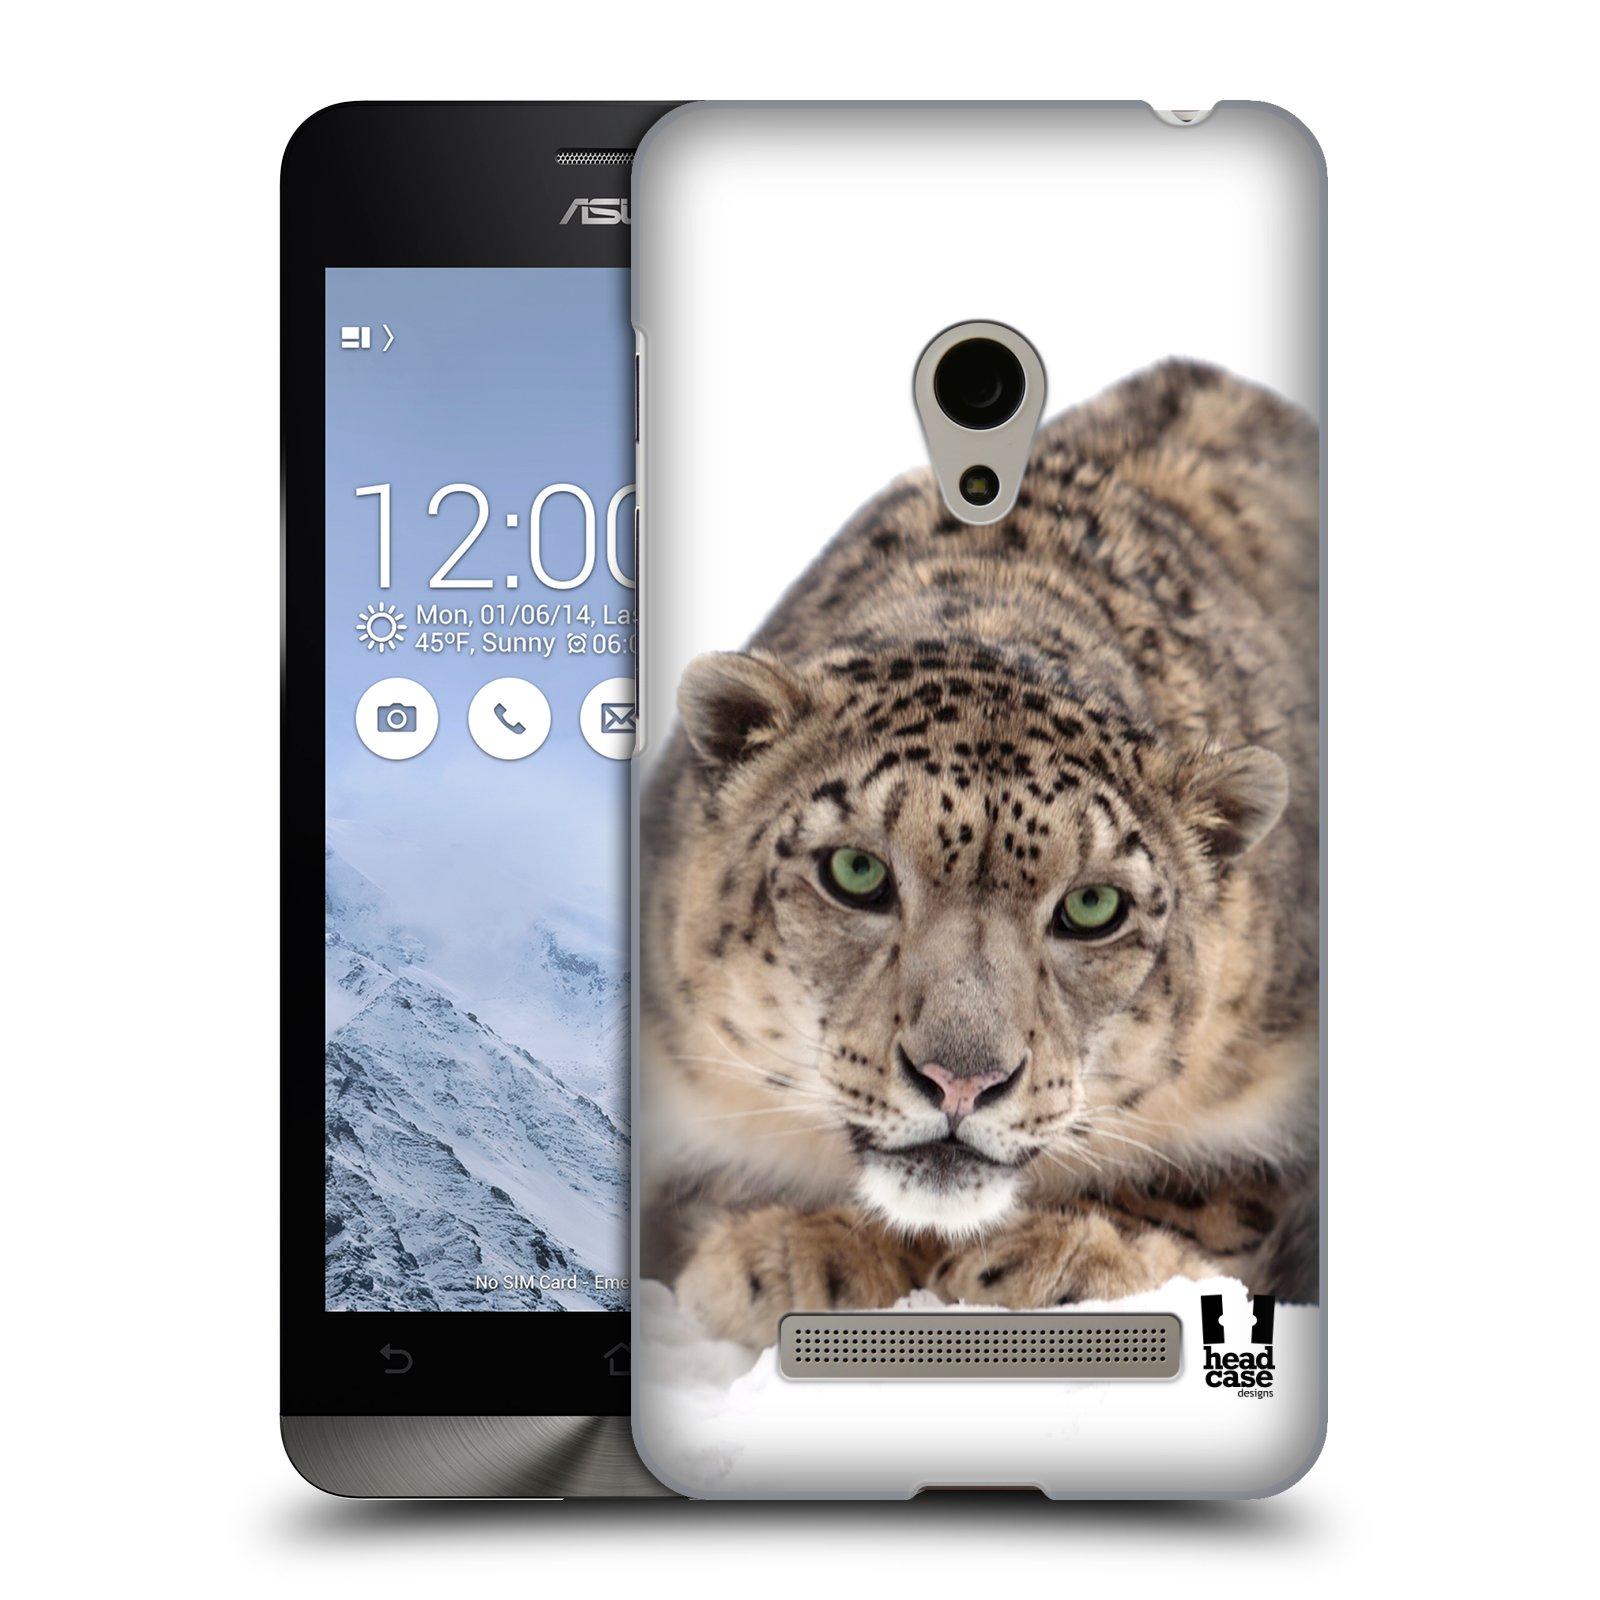 HEAD CASE plastový obal na mobil Asus Zenfone 5 vzor Divočina, Divoký život a zvířata foto SNĚŽNÝ LEOPARD